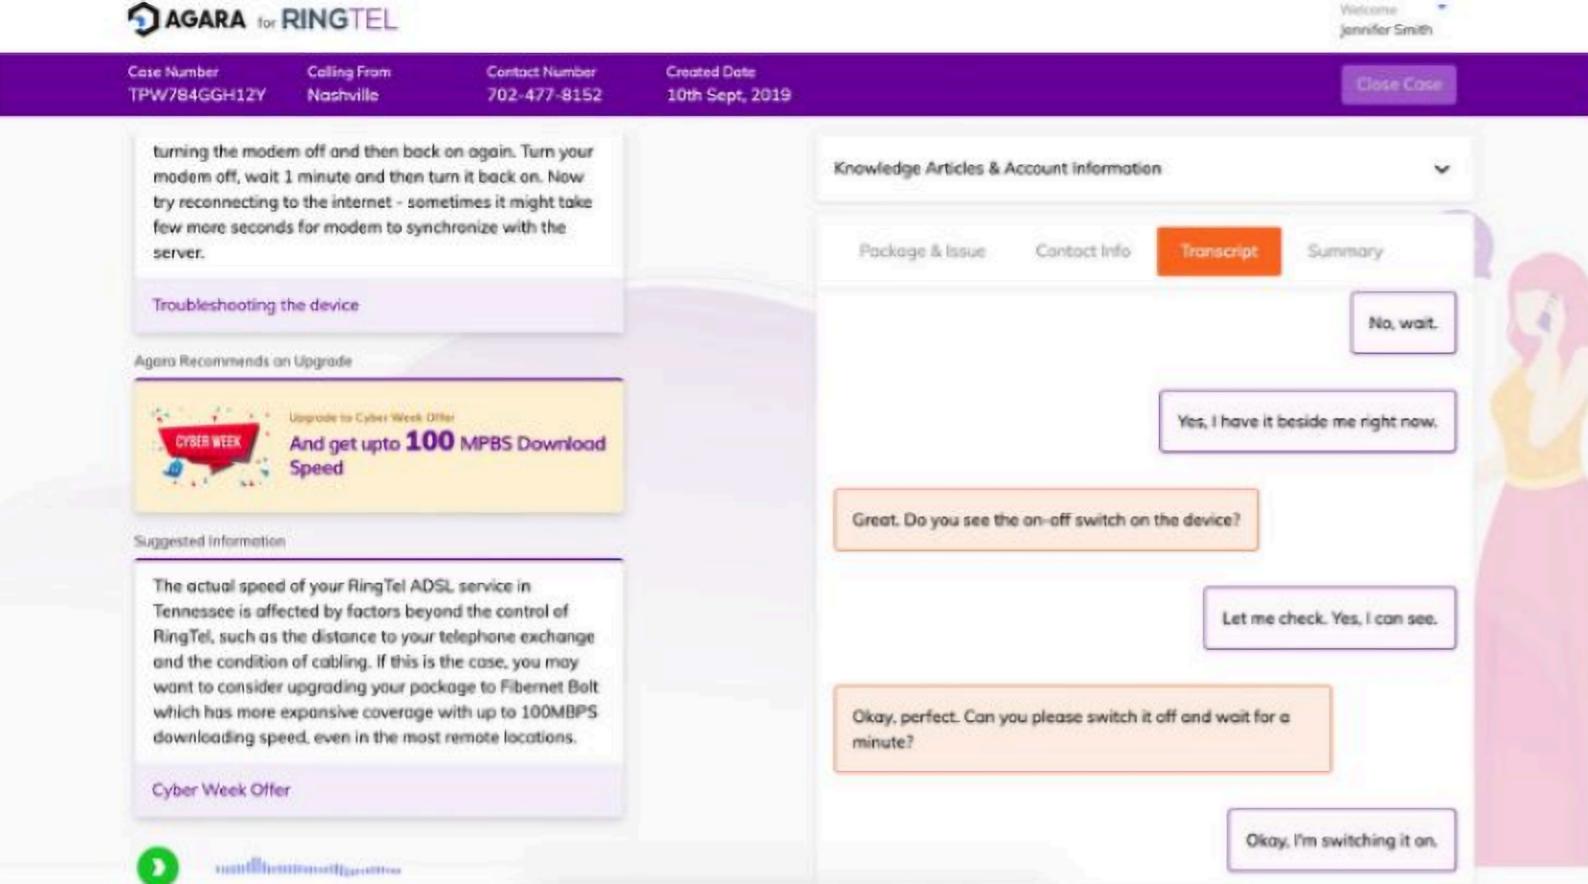 Agara helped Procter & Gamble automate 80% of customer service rep tasks